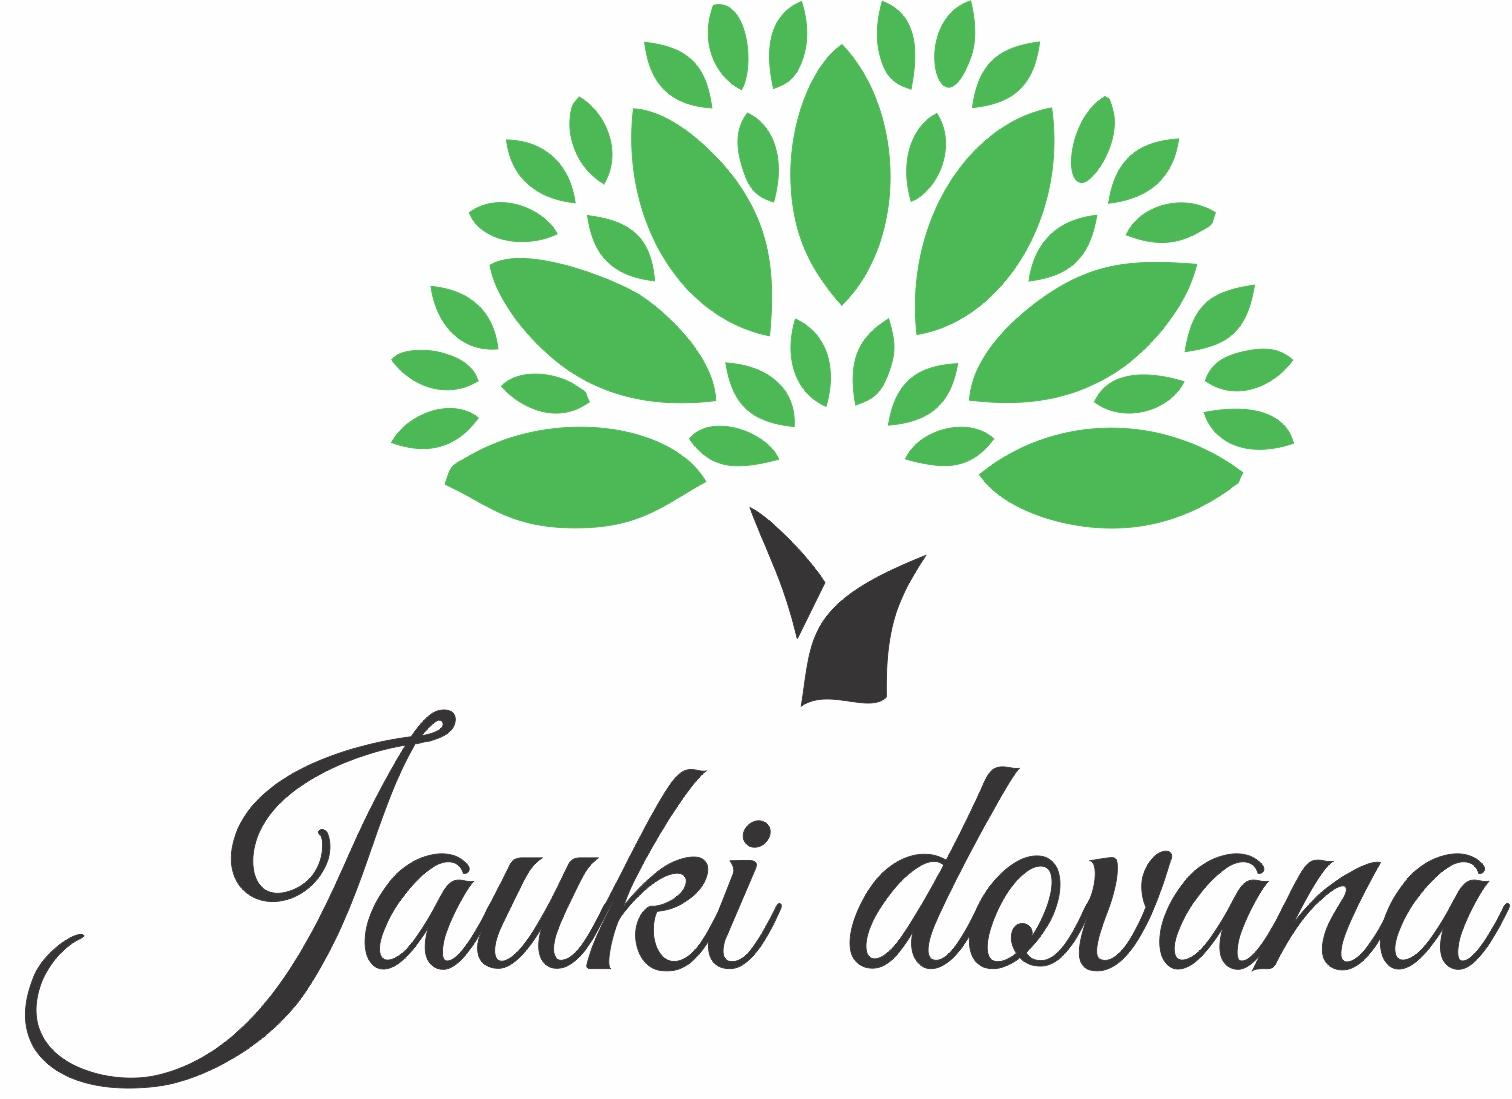 Jauki Dovana